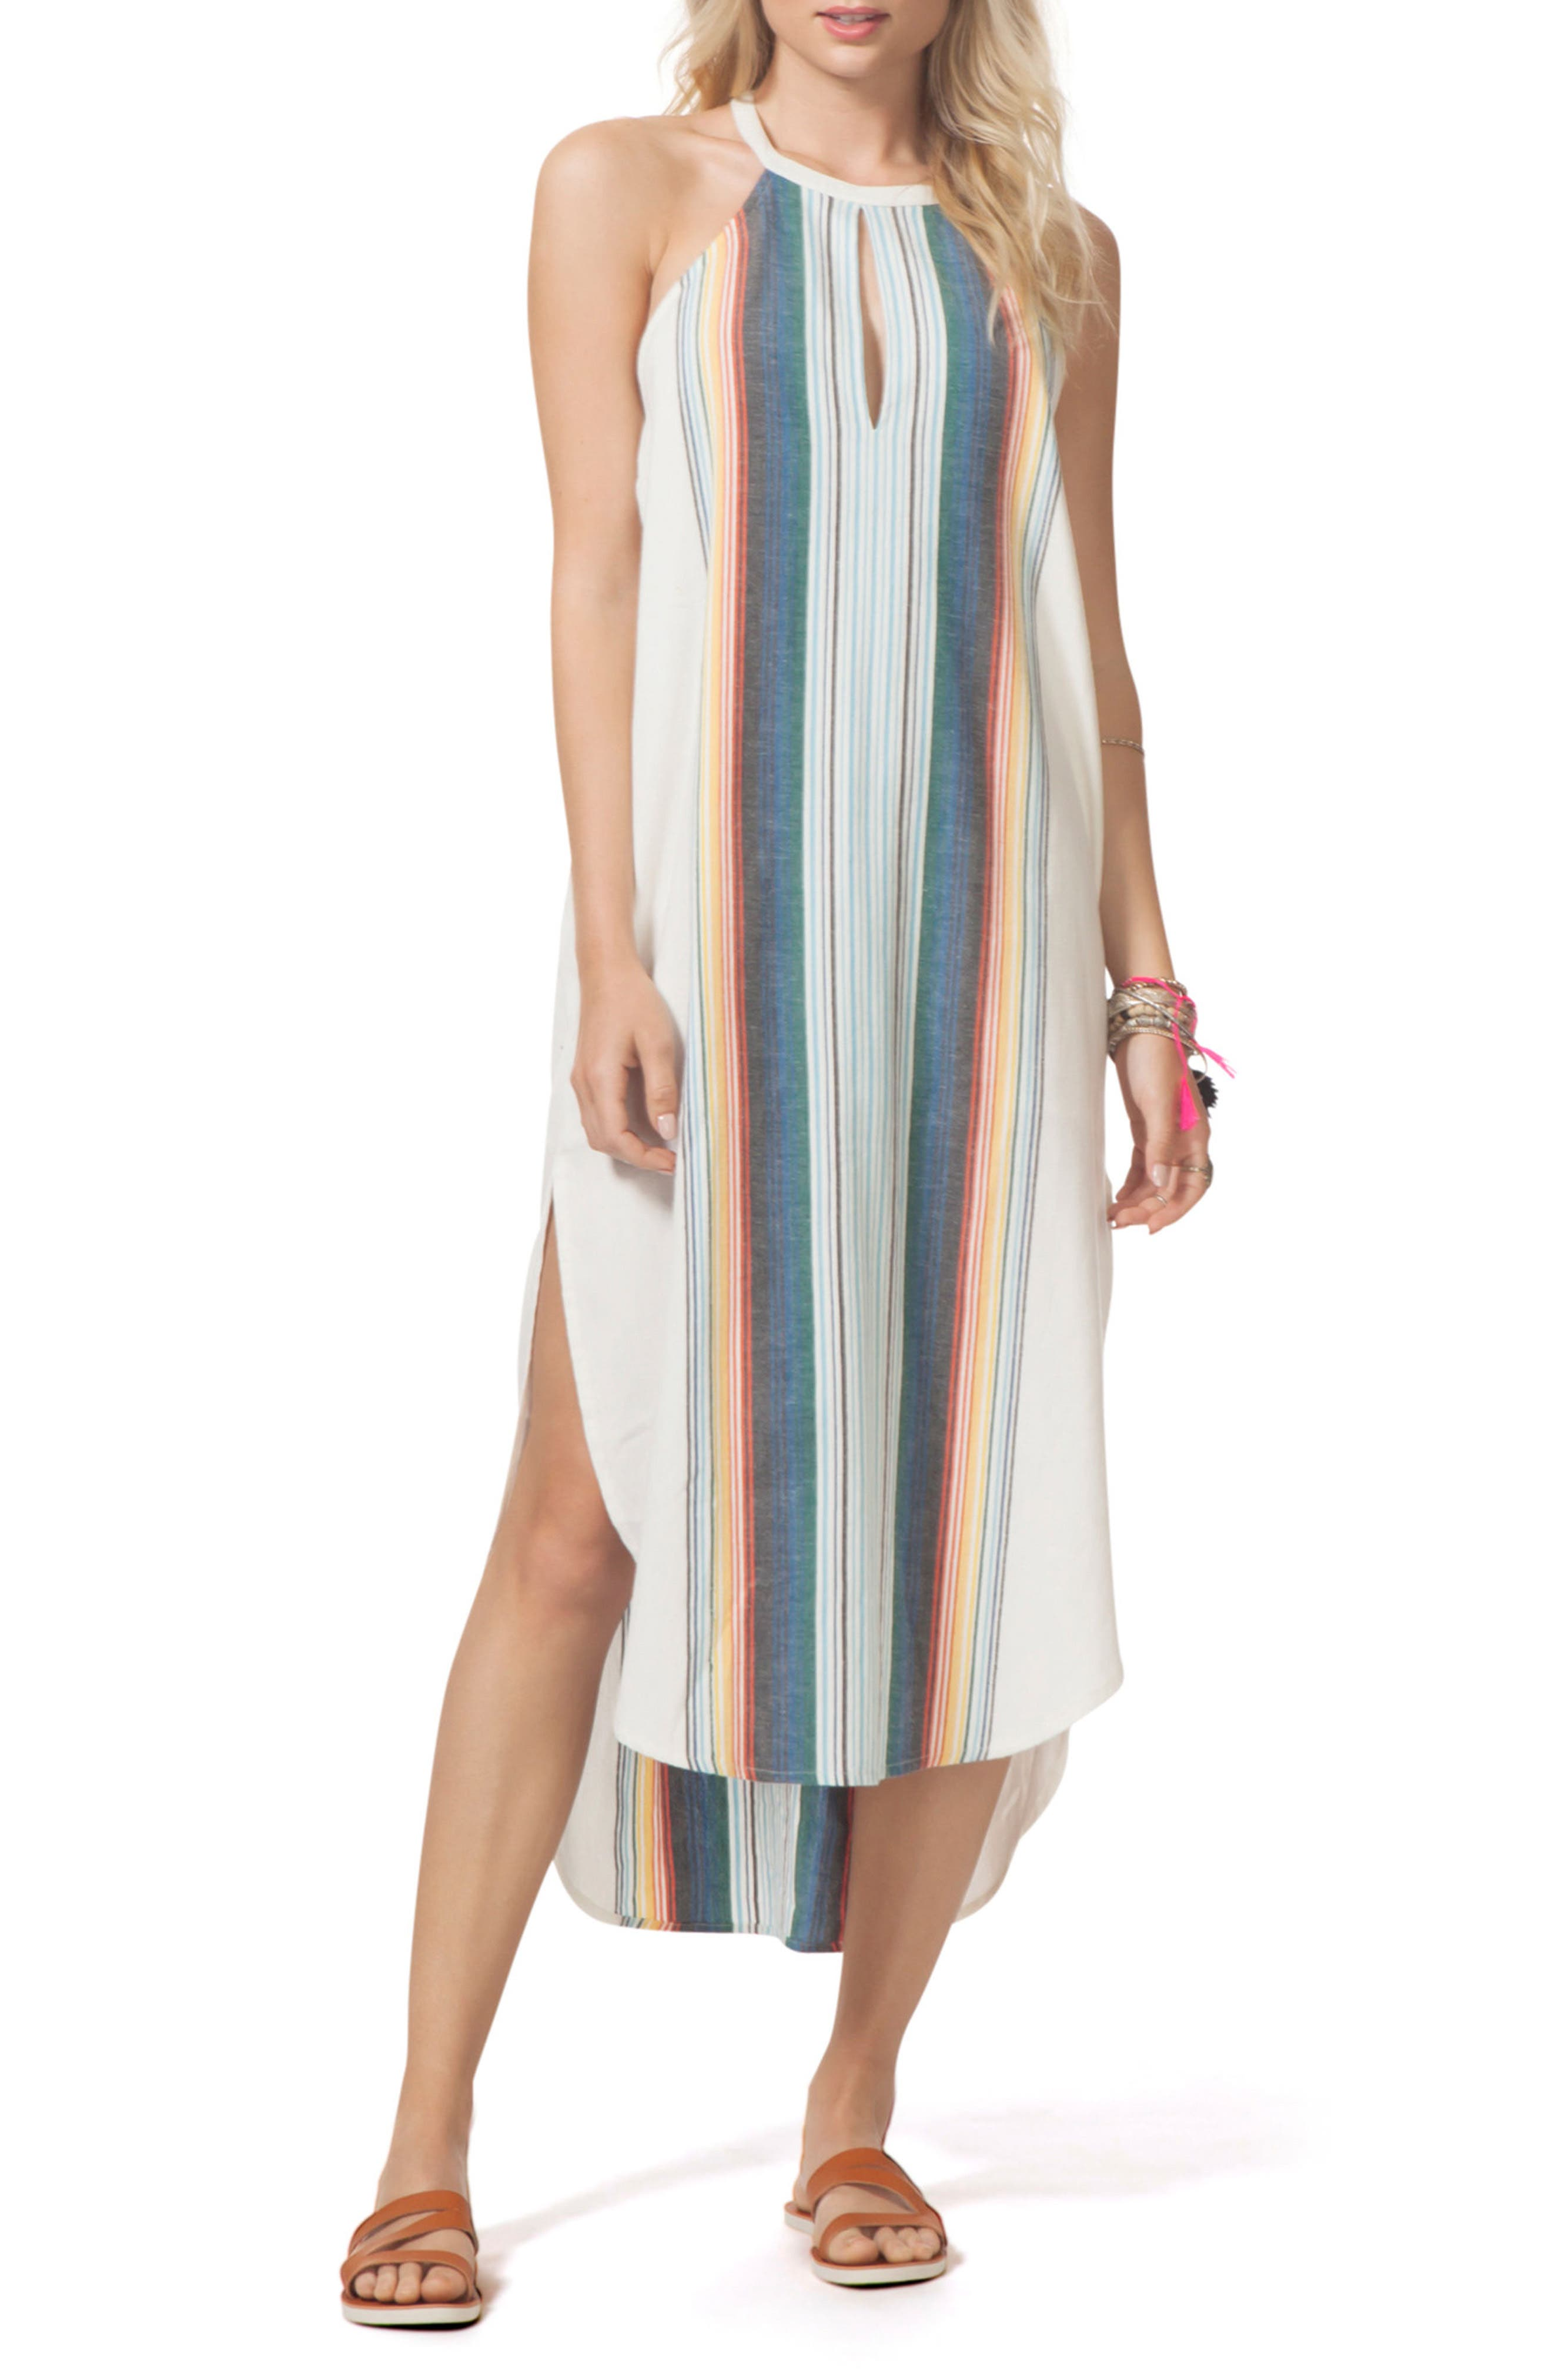 Beach Bazaar Maxi Dress,                             Alternate thumbnail 3, color,                             111